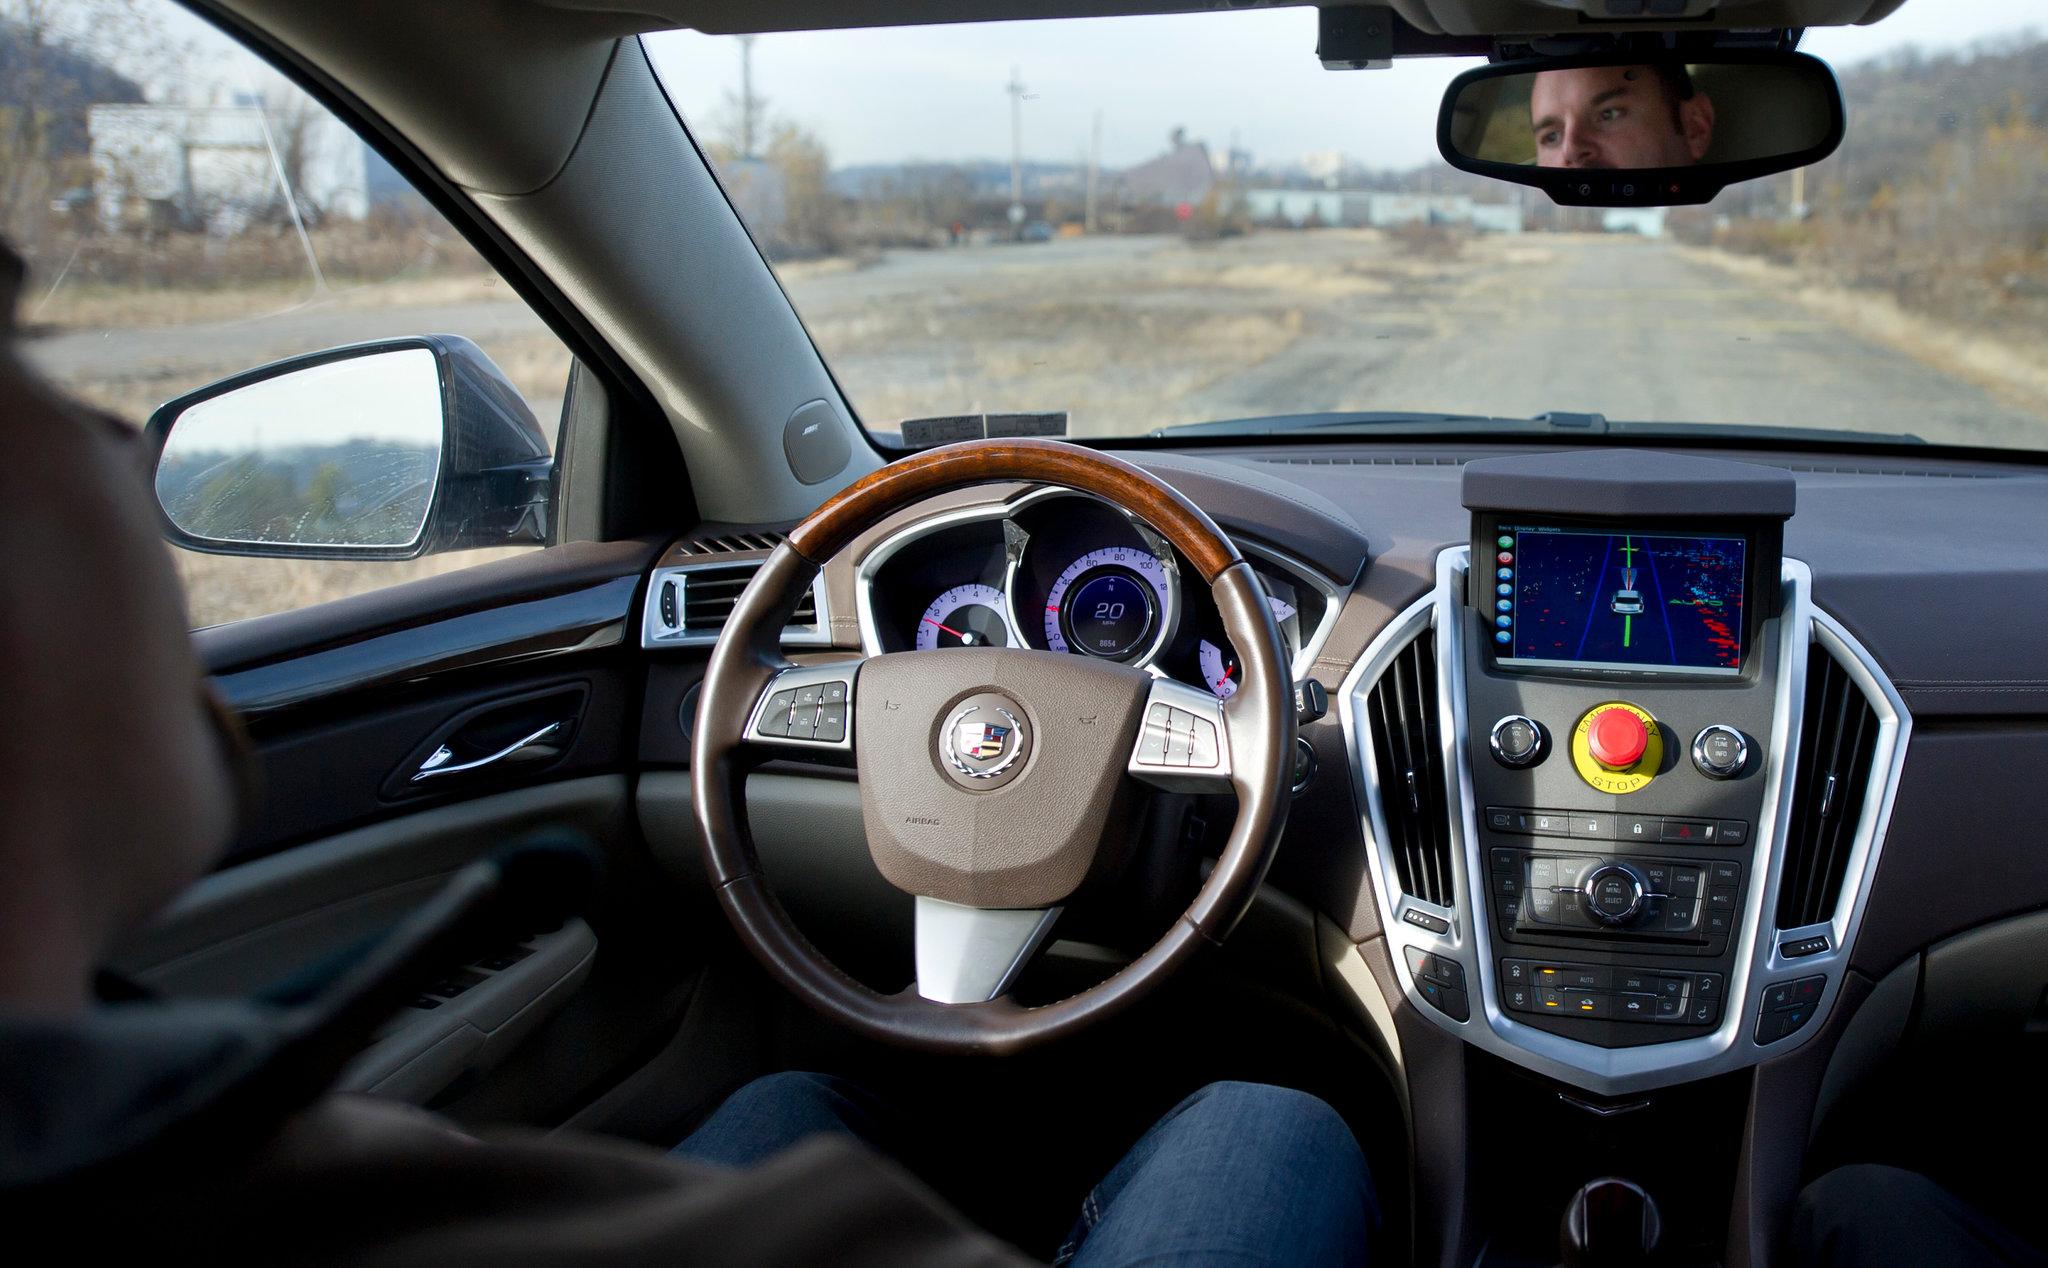 disrupt-driverless-car-superJumbo